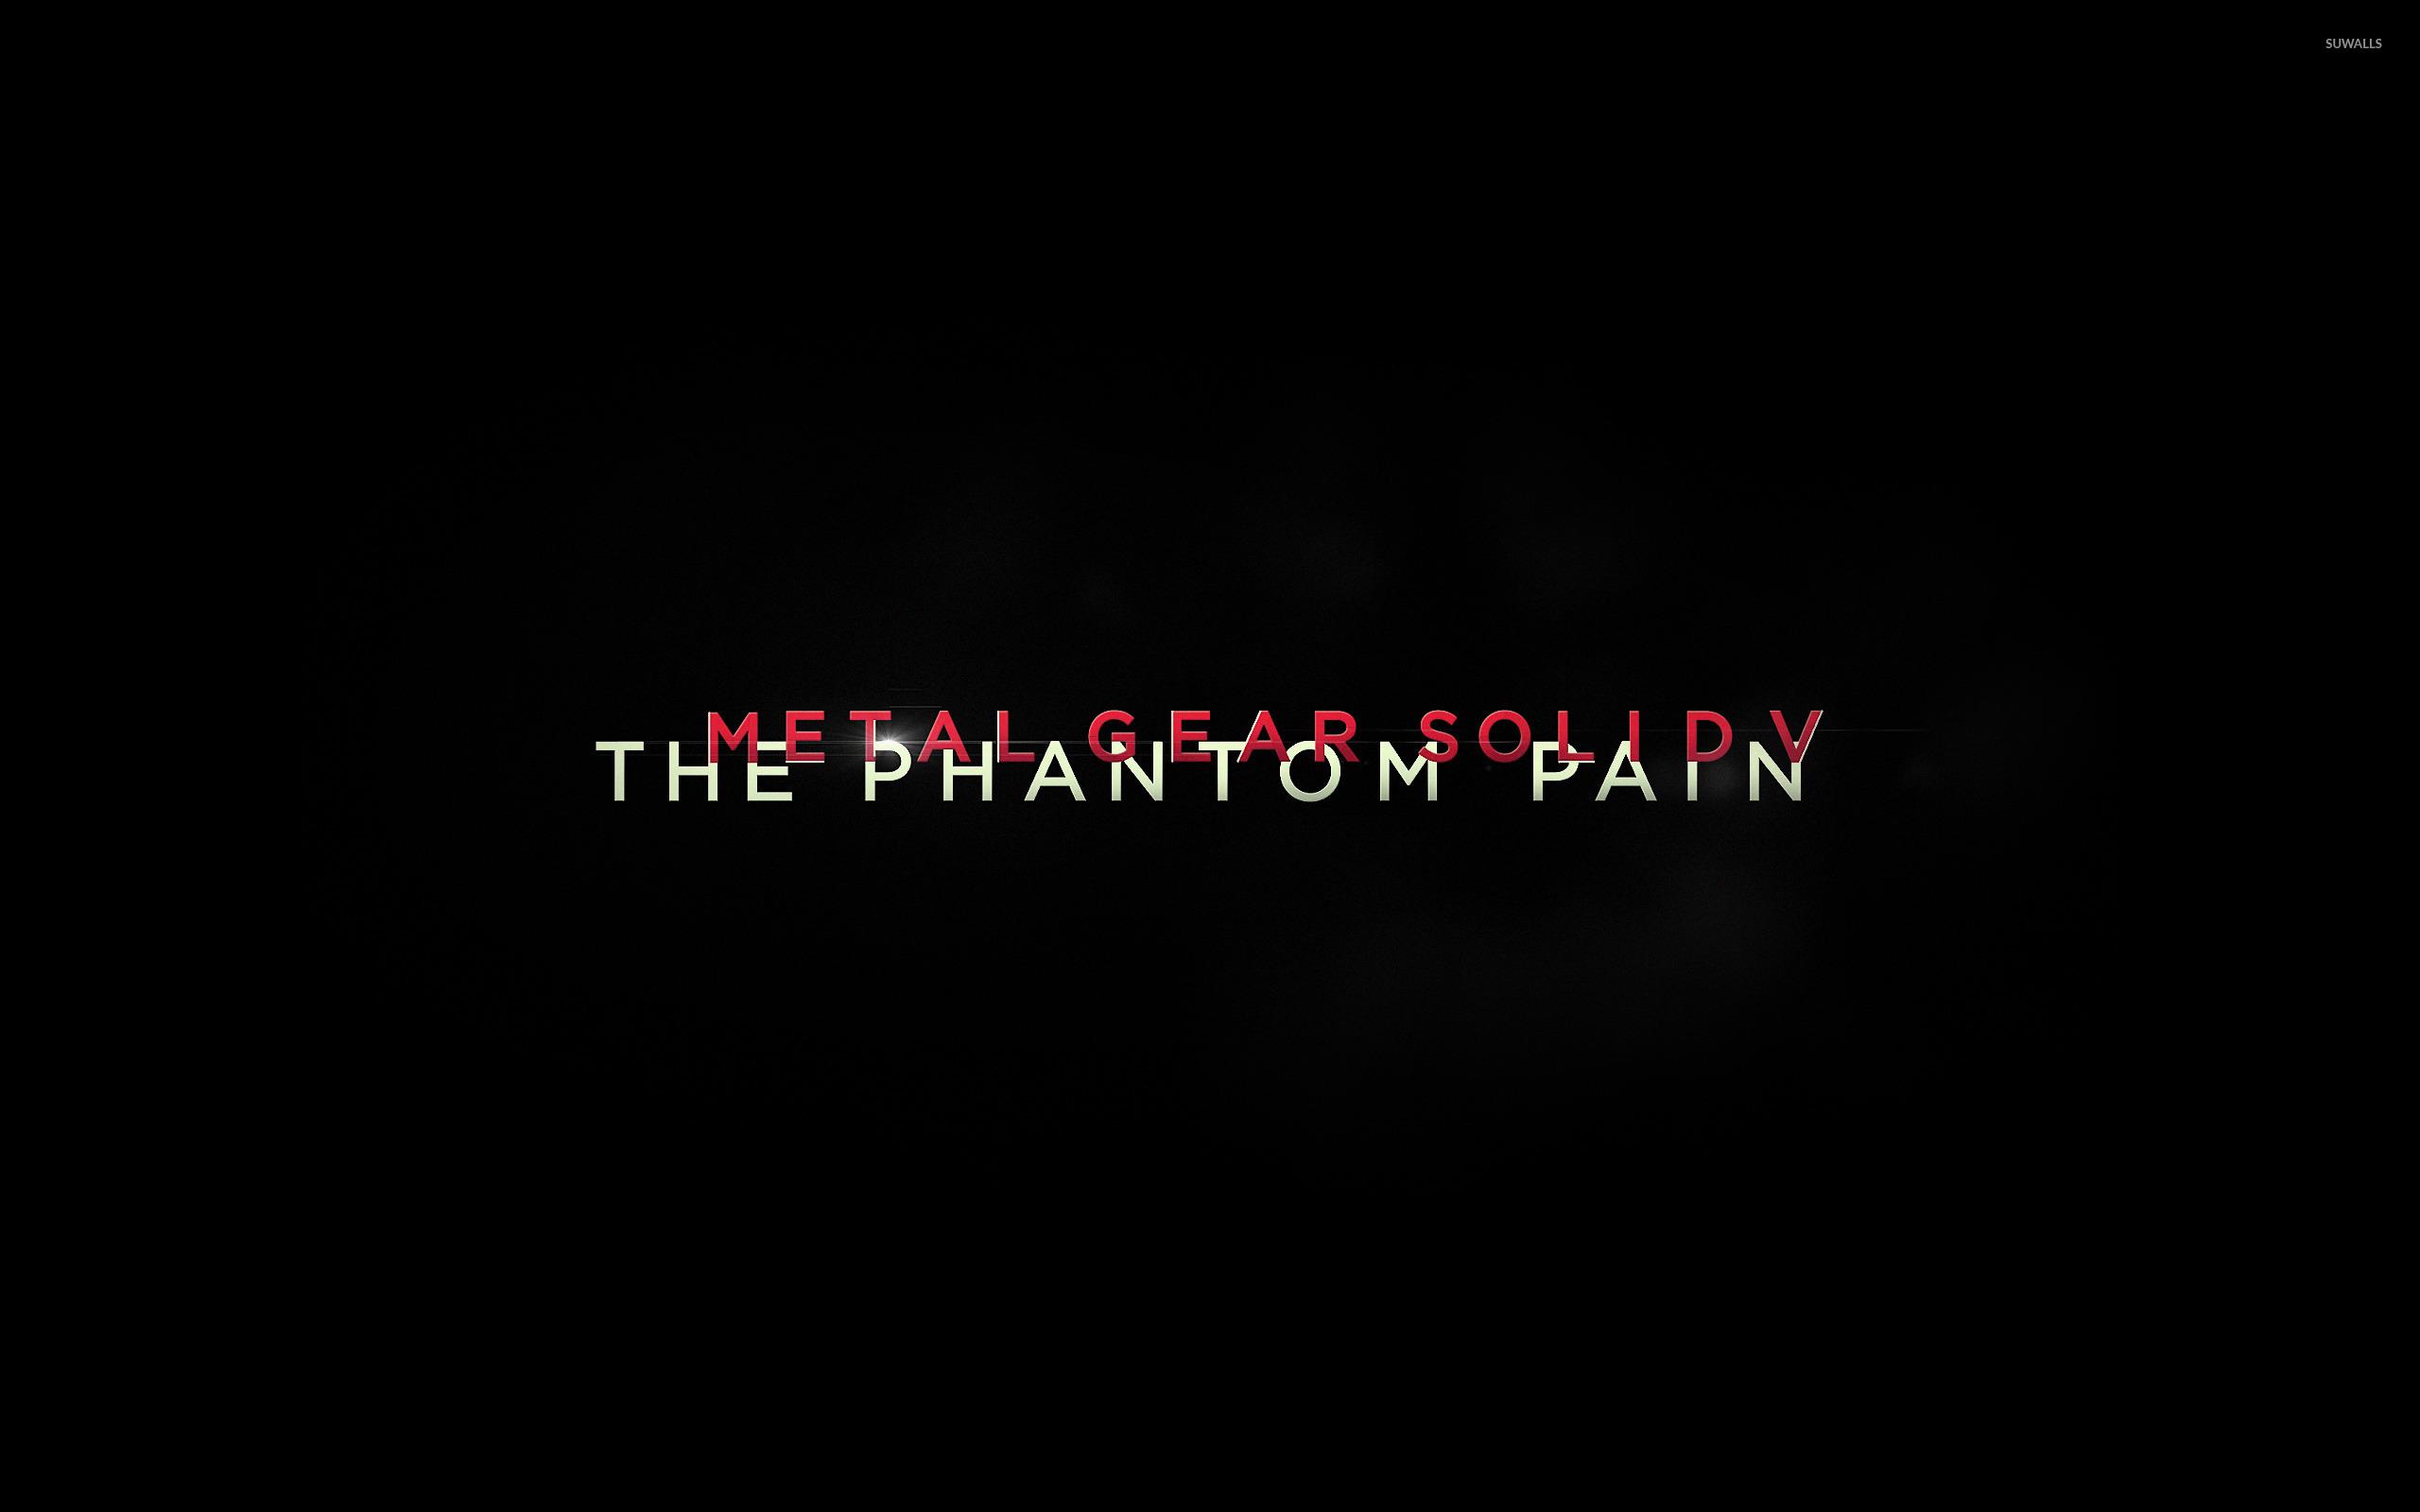 Metal Gear Solid V The Phantom Pain 4 Wallpaper Game